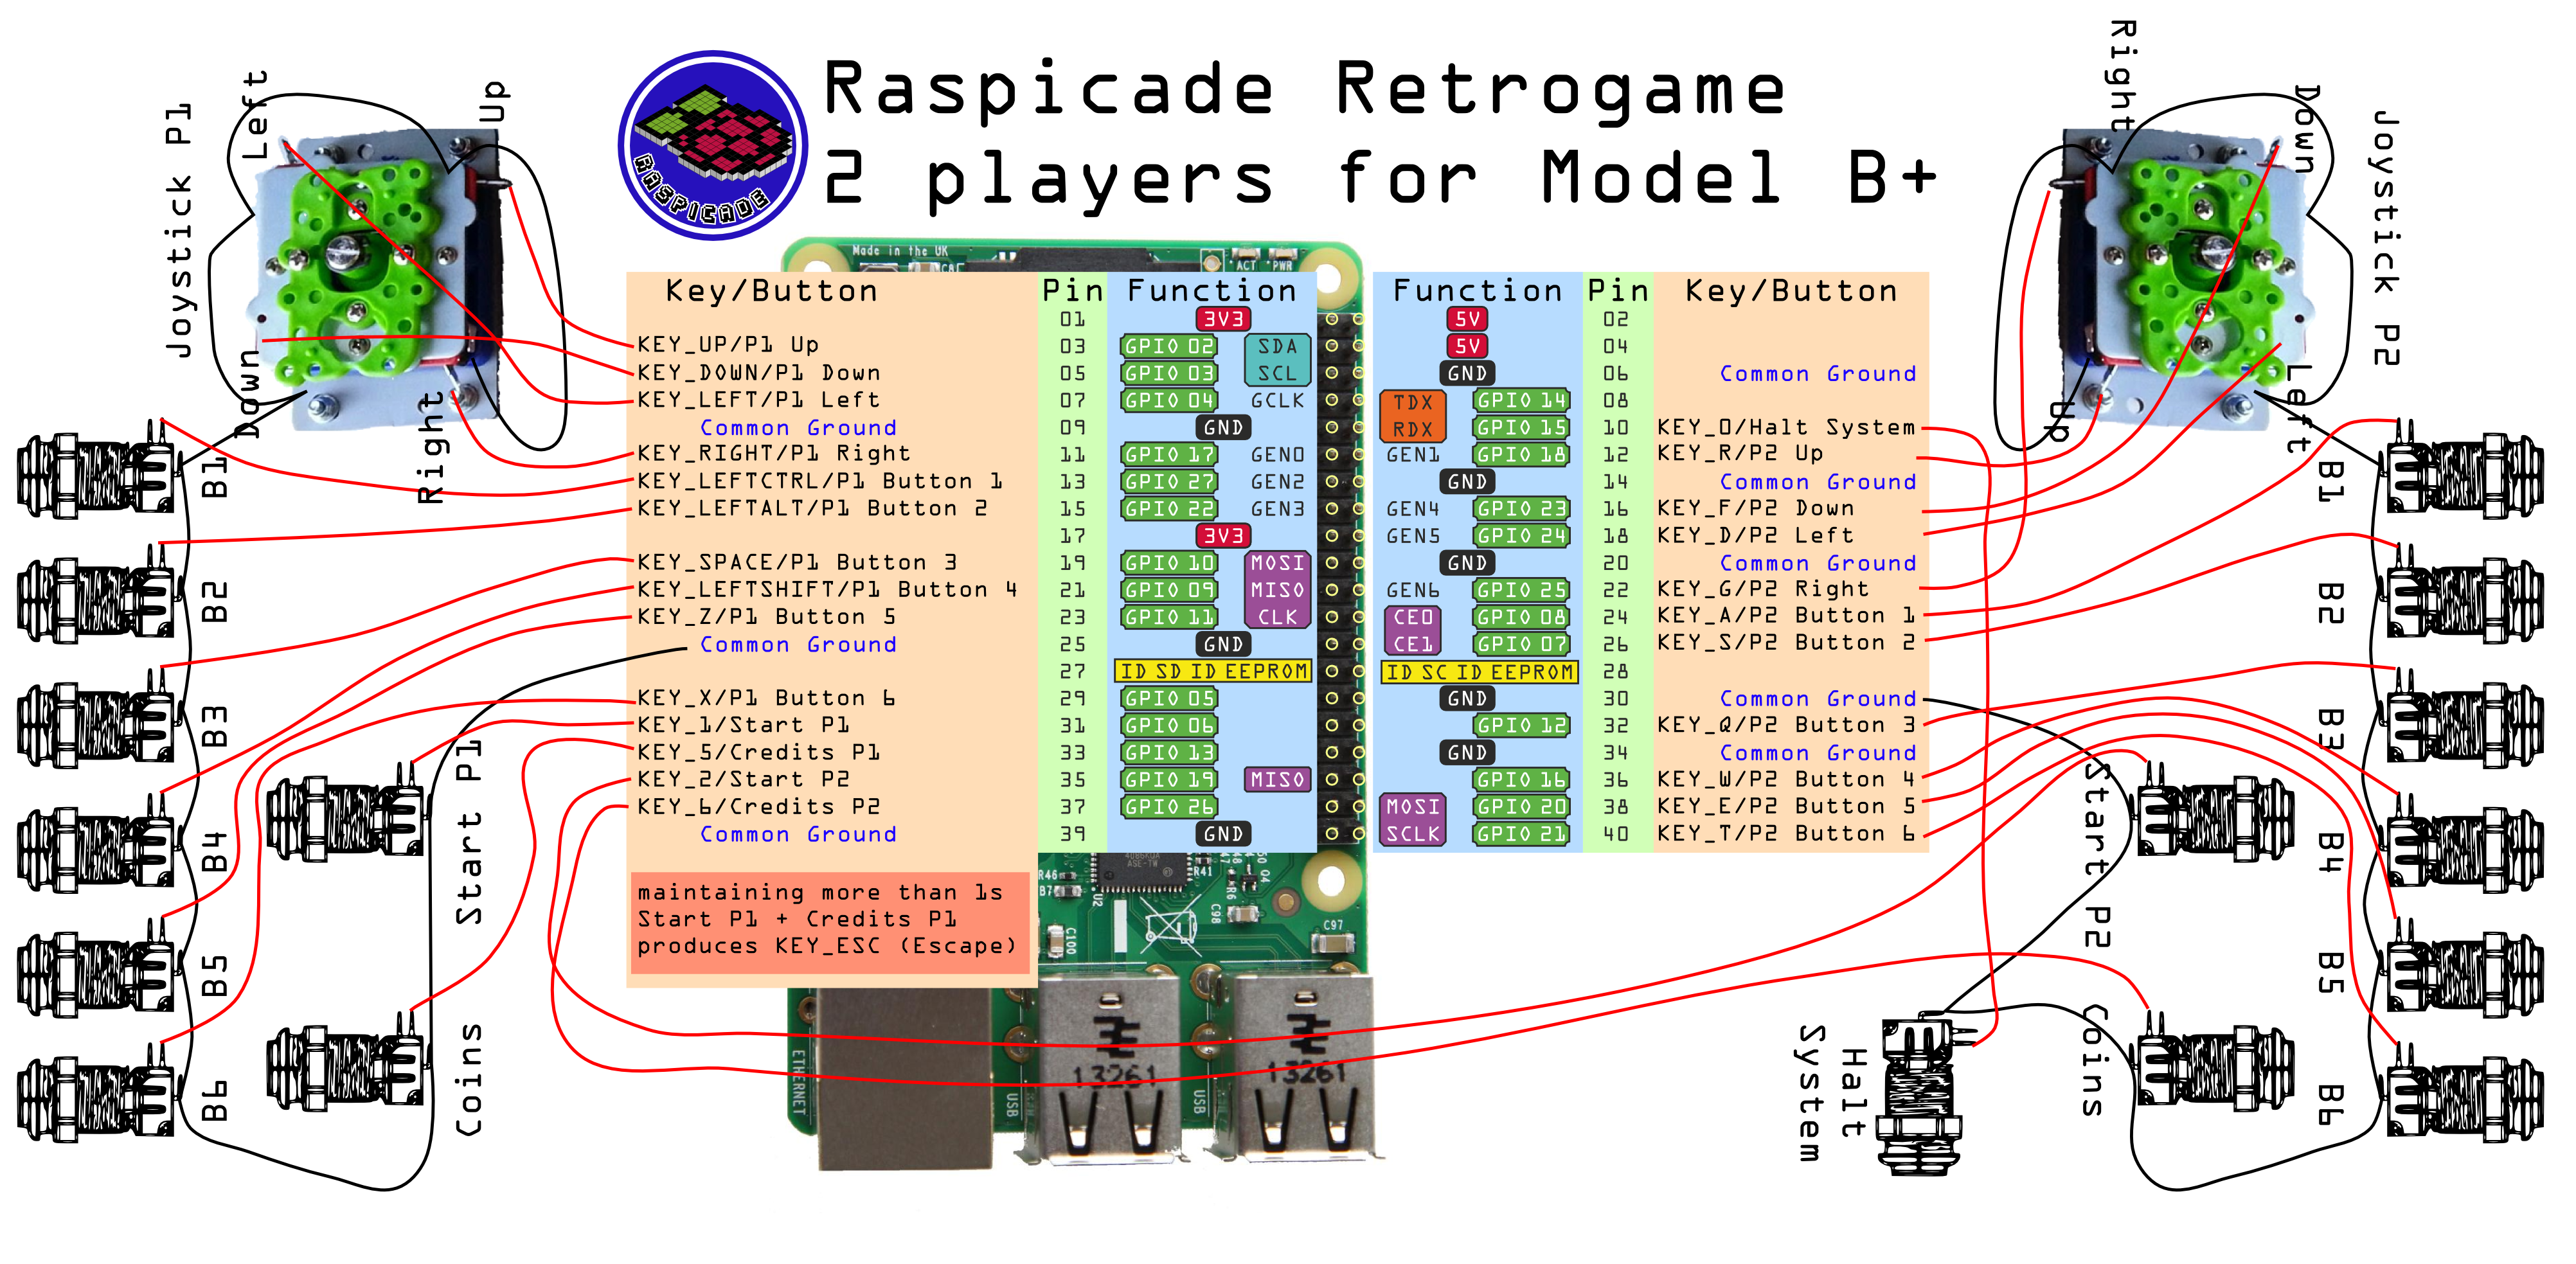 [TERMINÉ] Bartop AKIRA sous Raspberry - Page 4 Raspicade_cablage